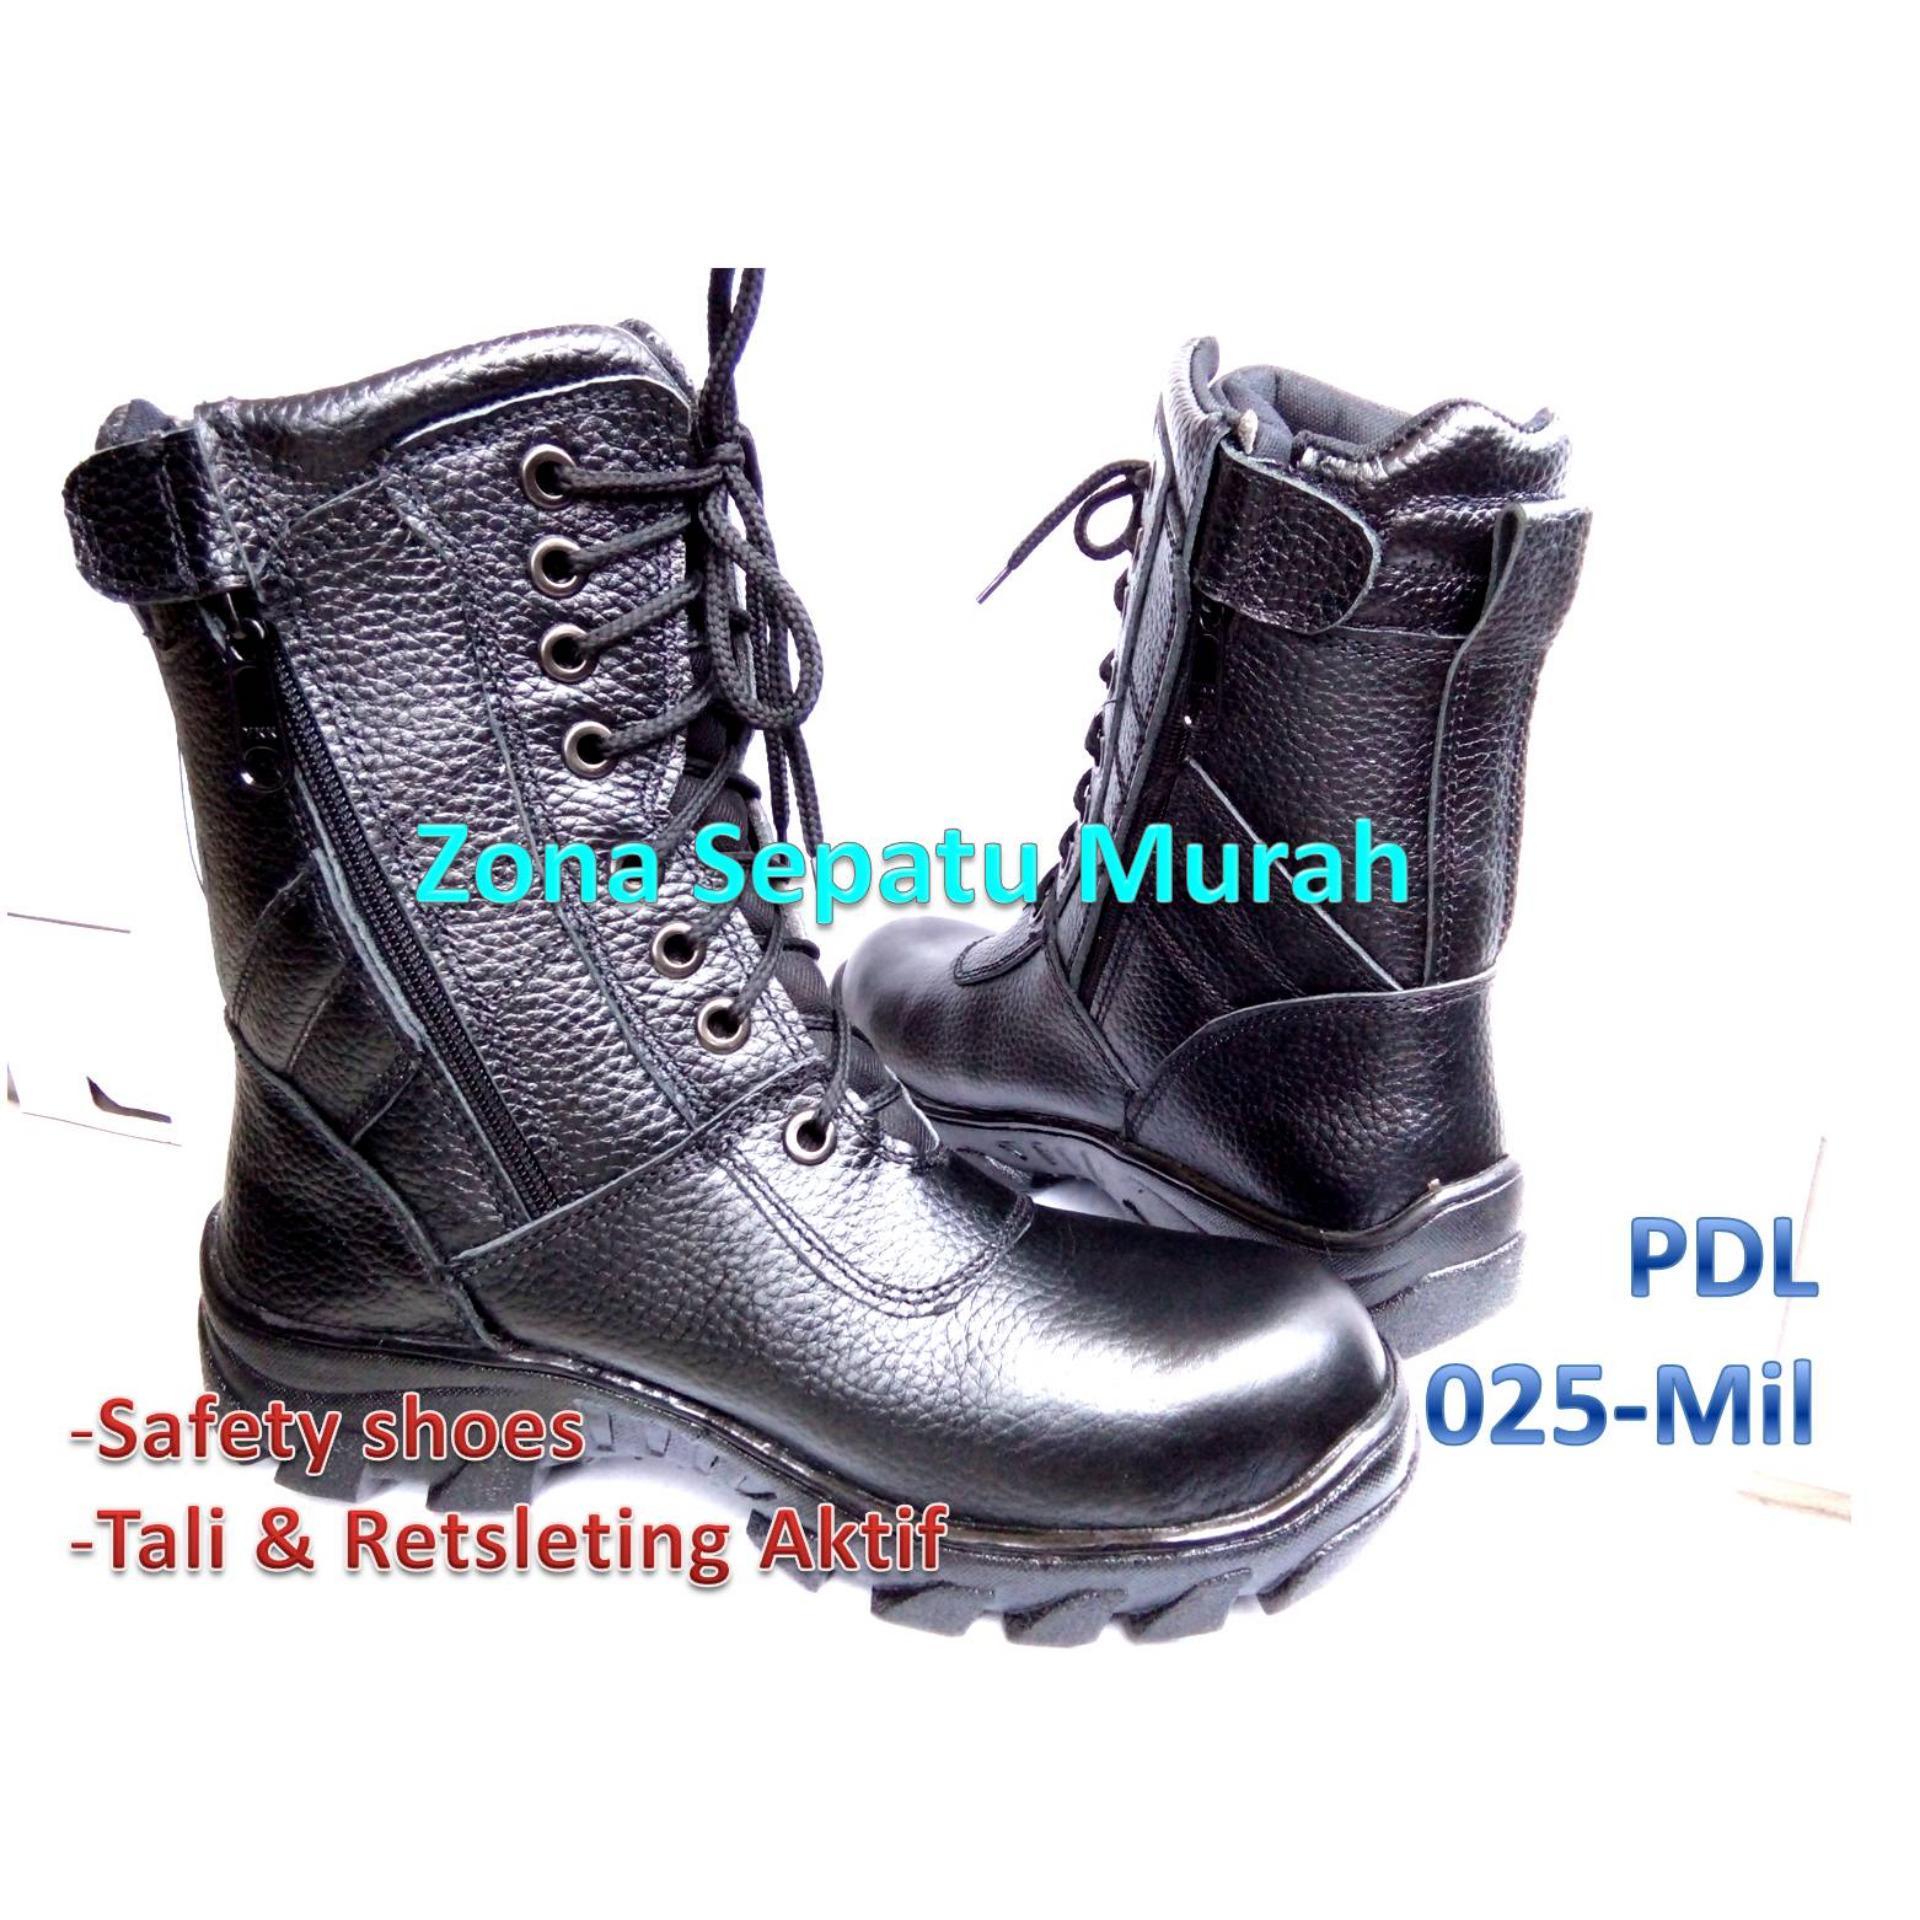 Sepatu Pdl Seri Kobra Mil Standar Tni Polri Security Dll Bestquality Ter Safety Model 025 Motif Kulit Jeruk Safetytni Best Quality